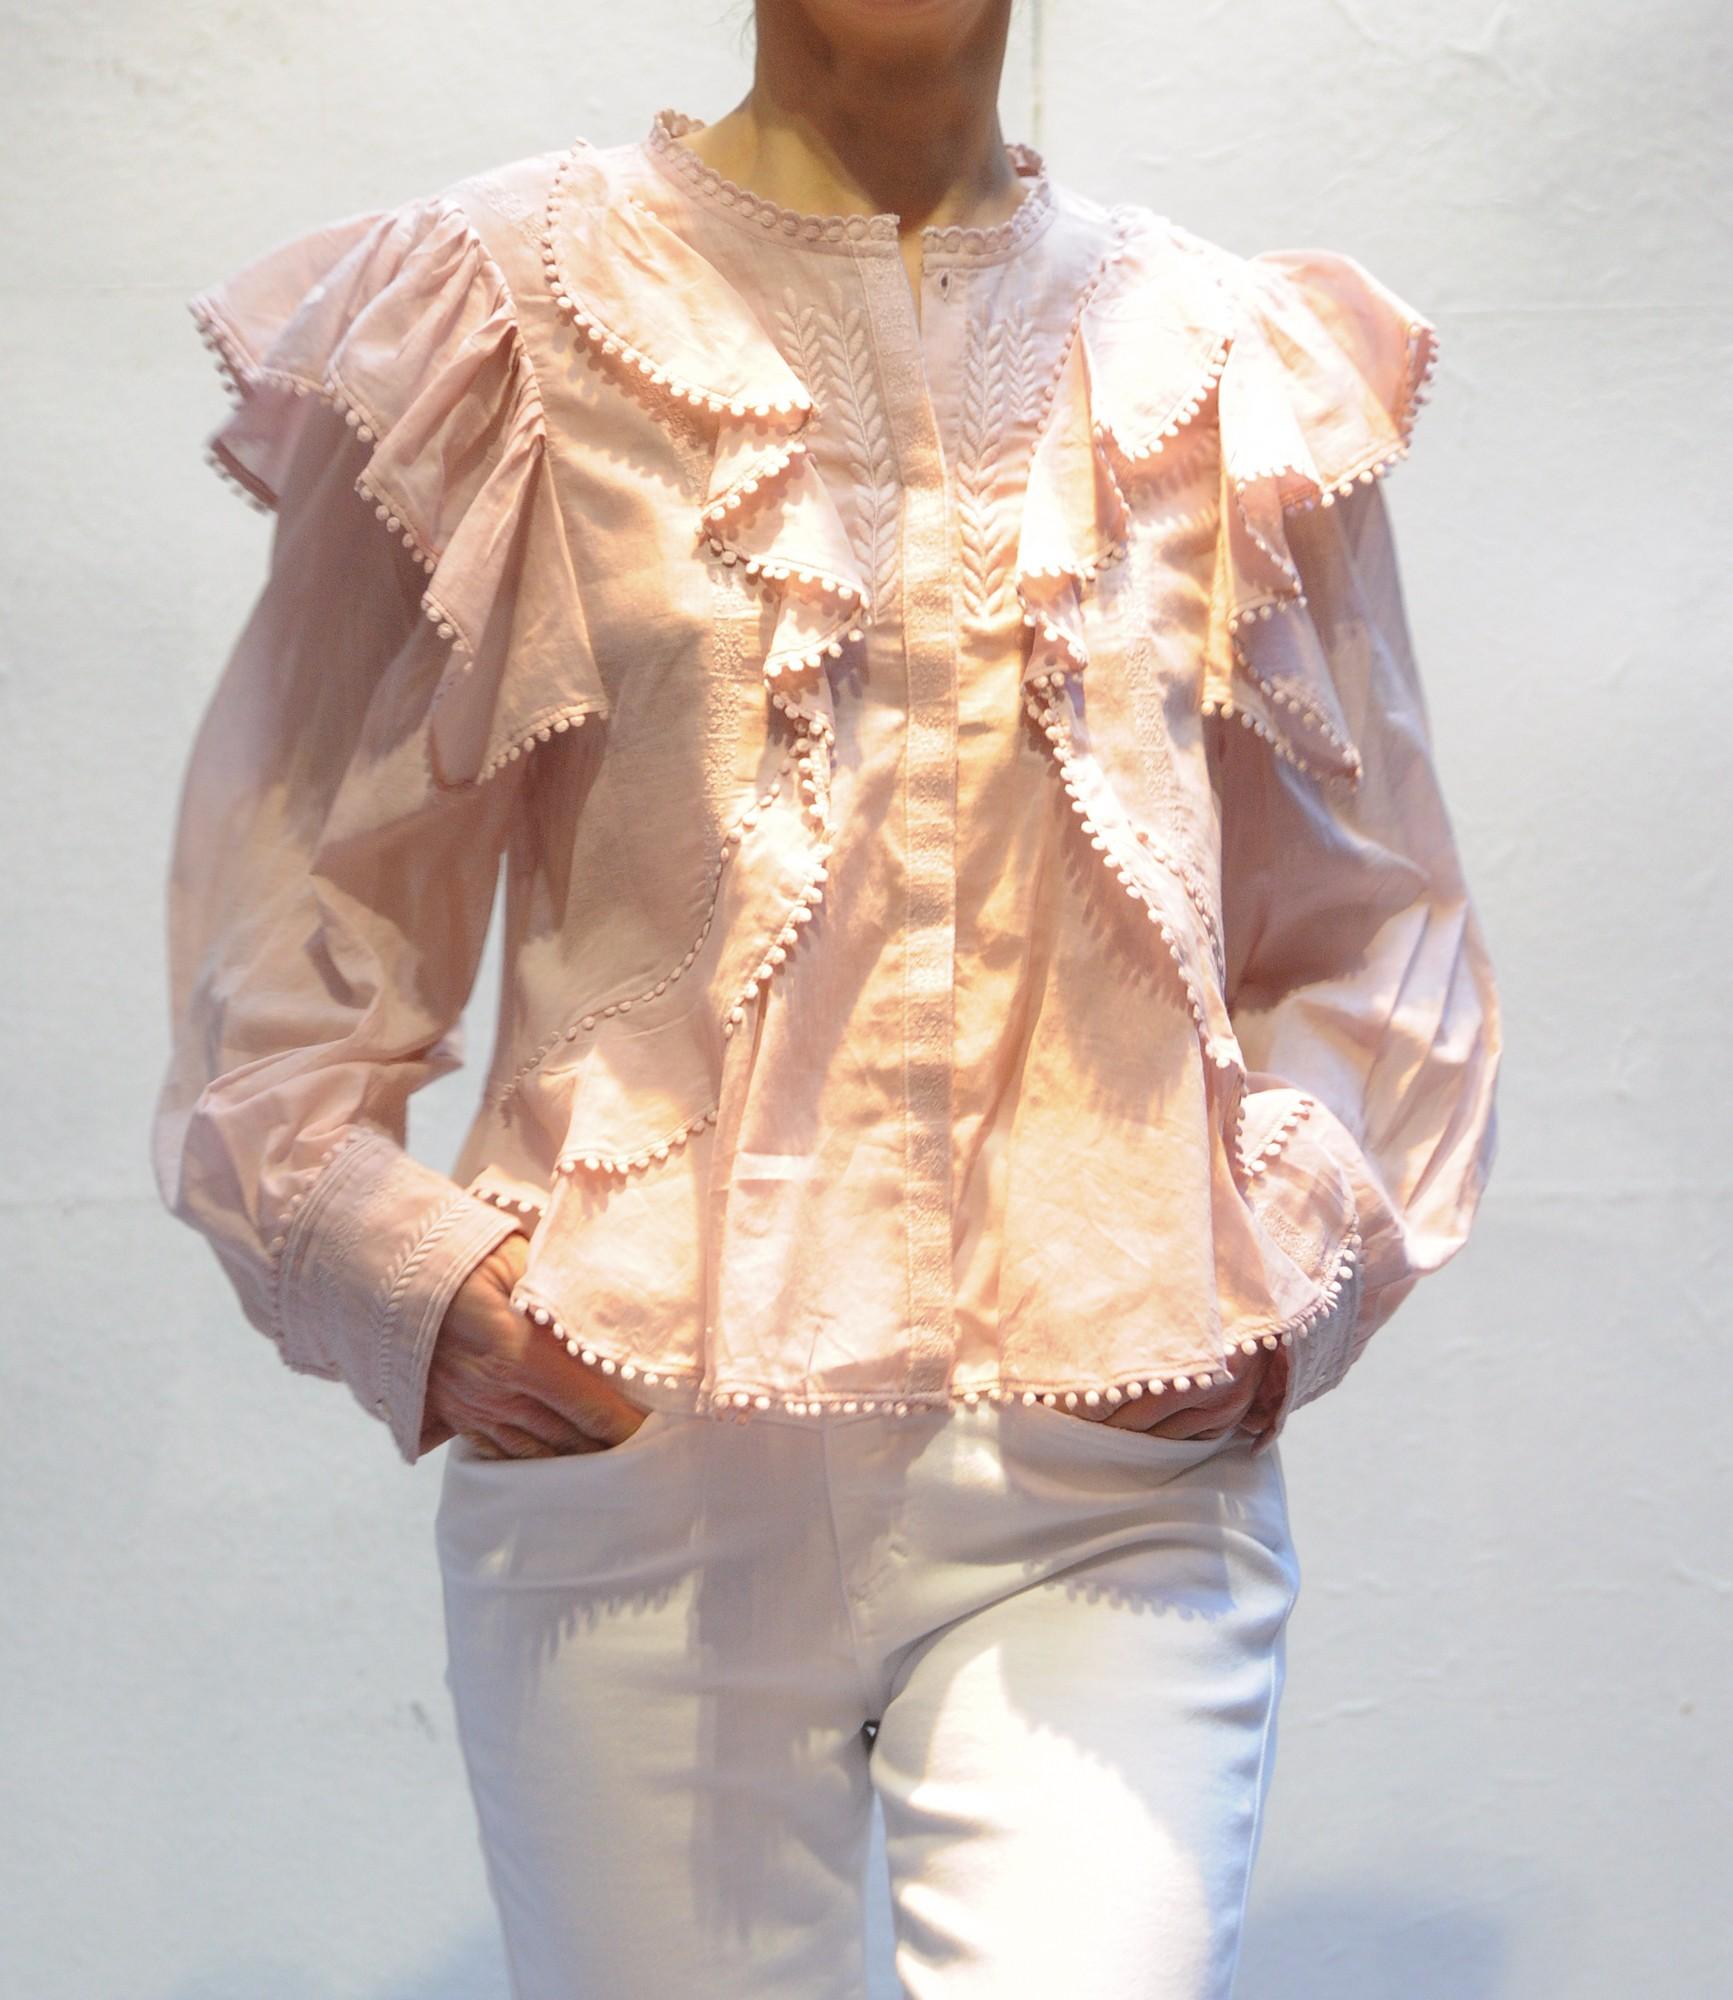 b471430b555f0 YCAO Isabel Marant long sleeves shirt cotton silk linin striped fabric